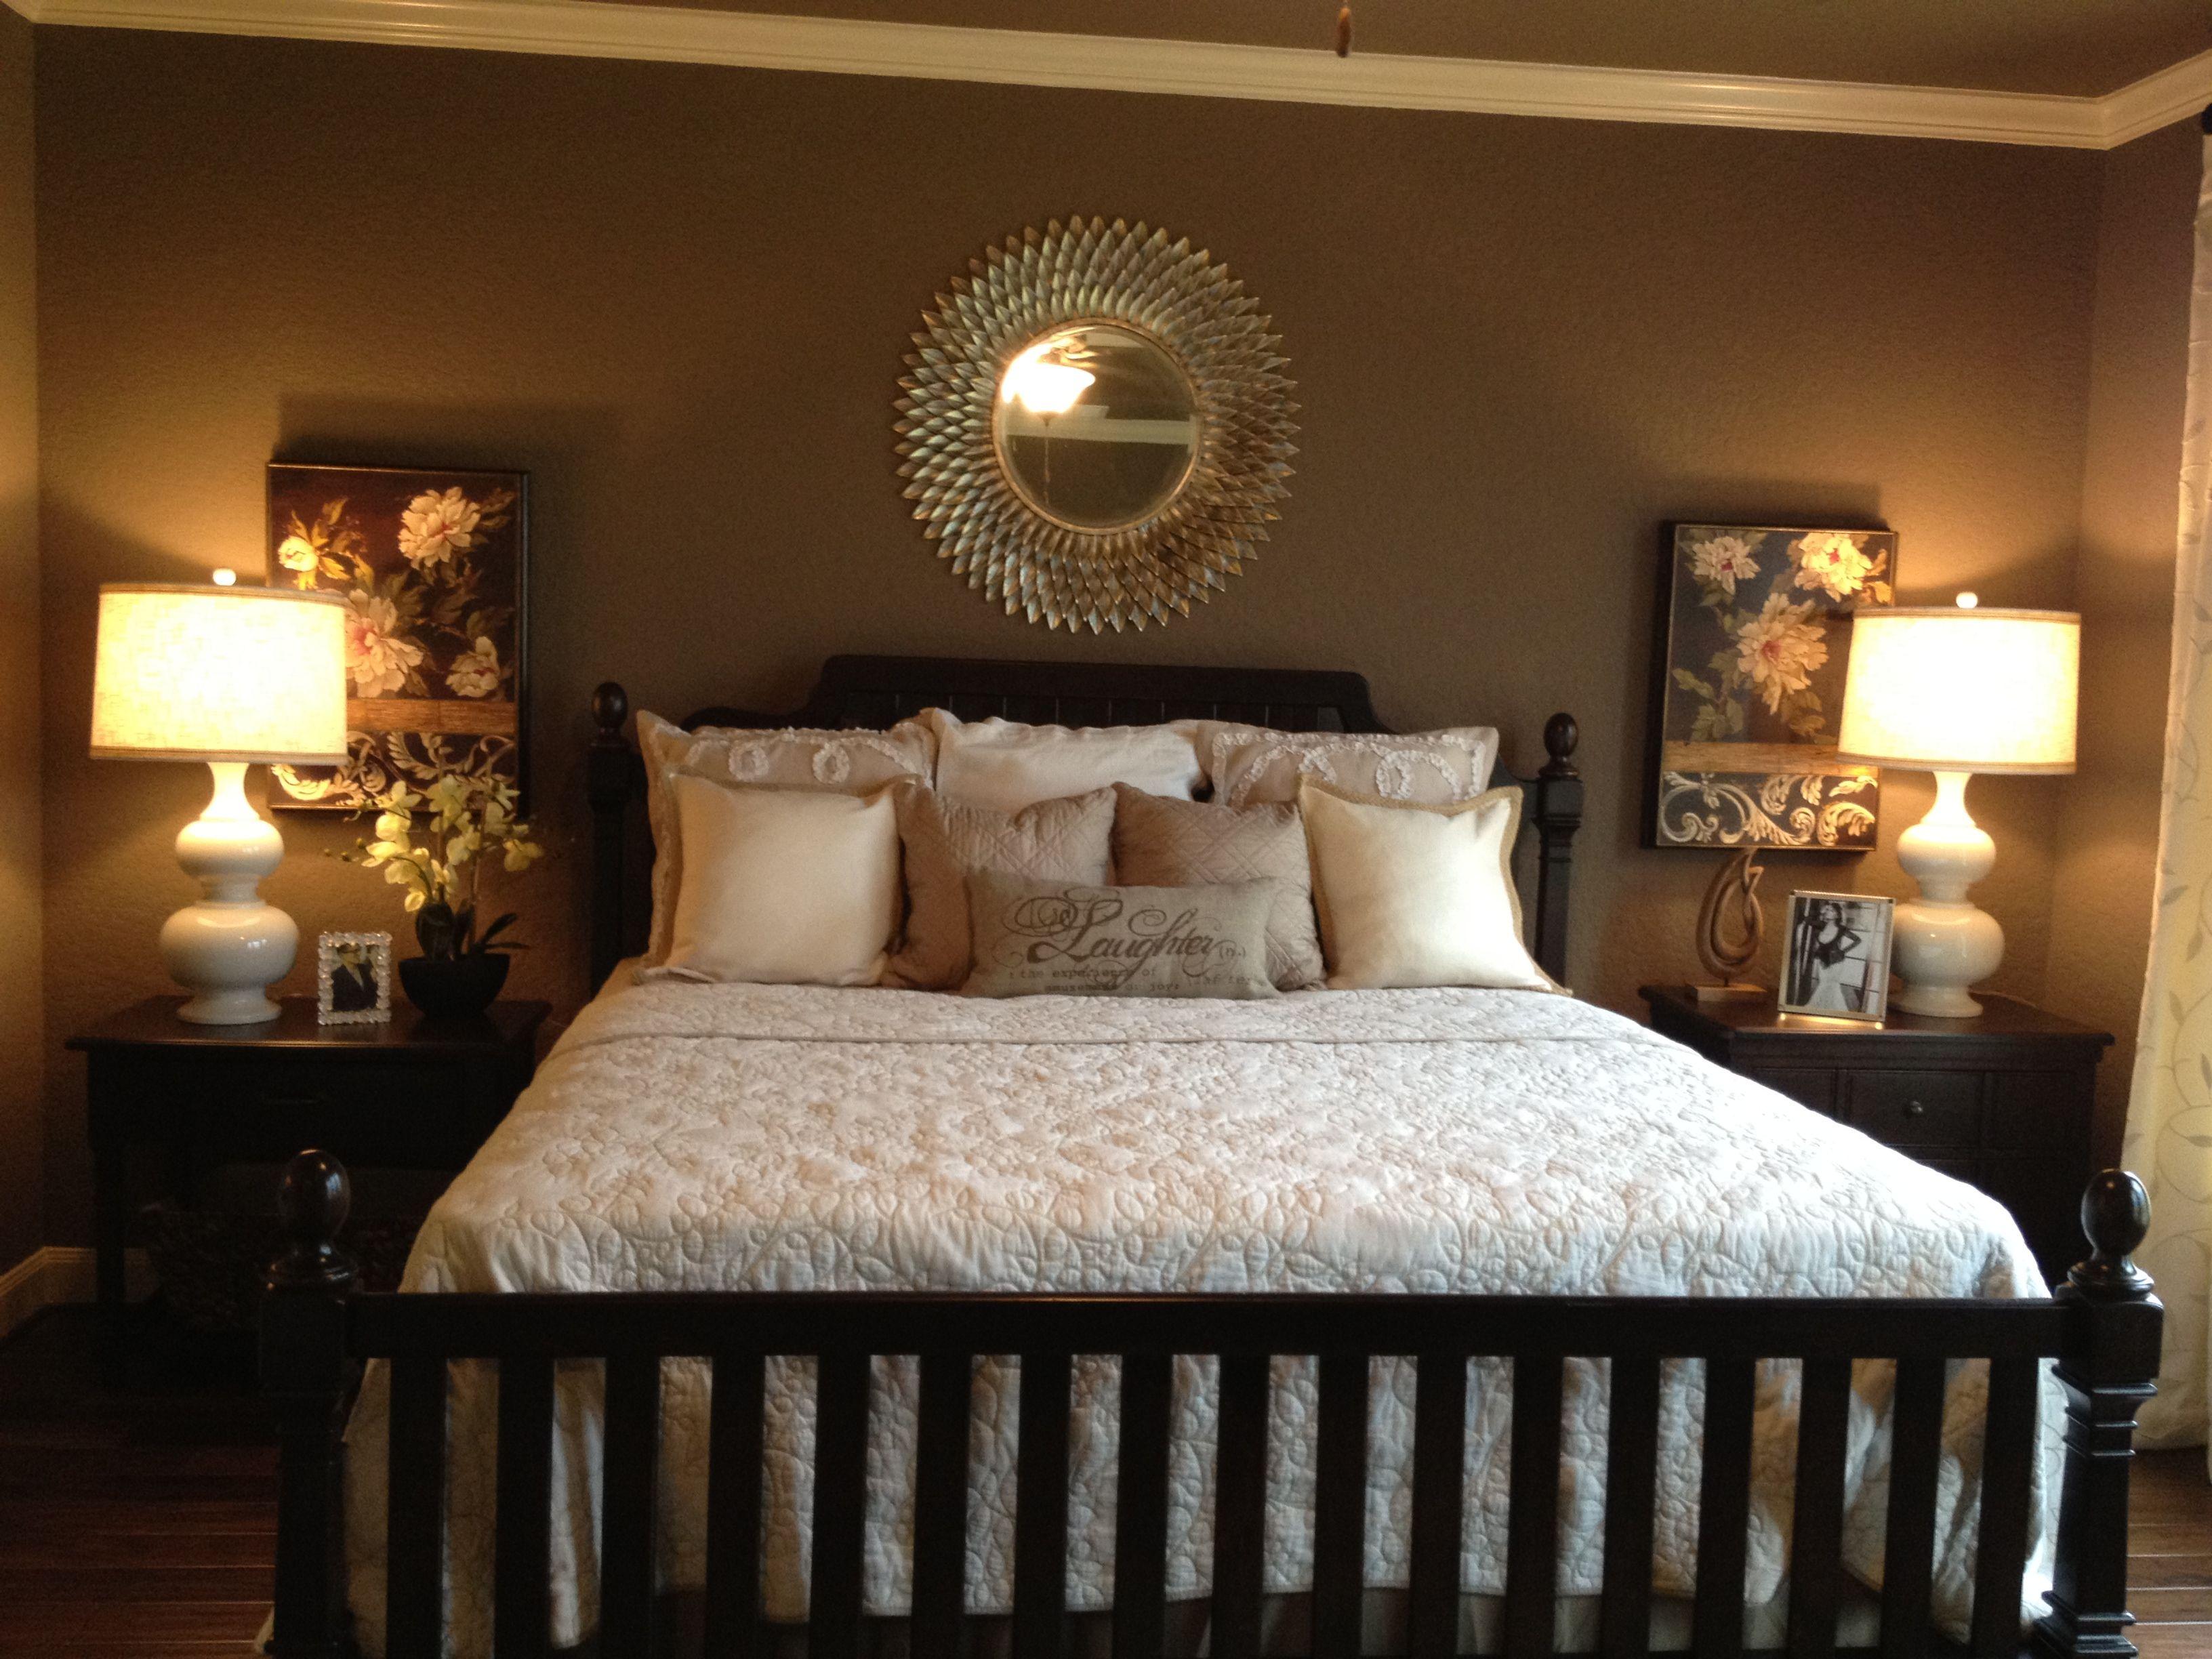 Apartment Bedroom Decor, Bedroom Decor